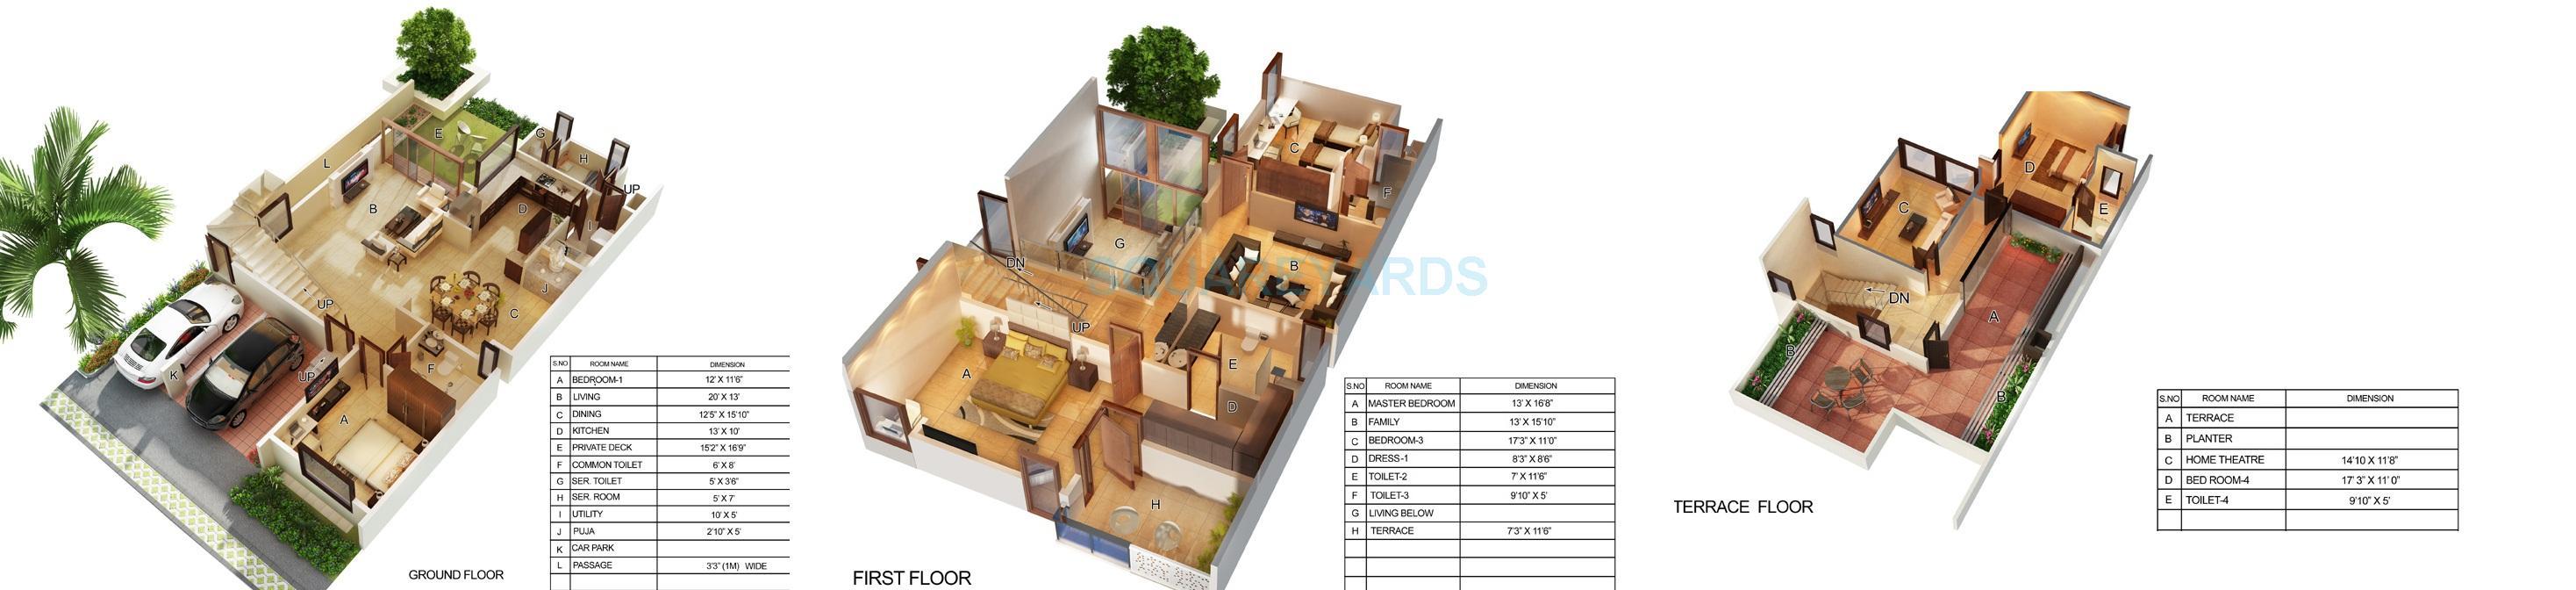 mantri courtyard villa 4bhk 3495sqft1